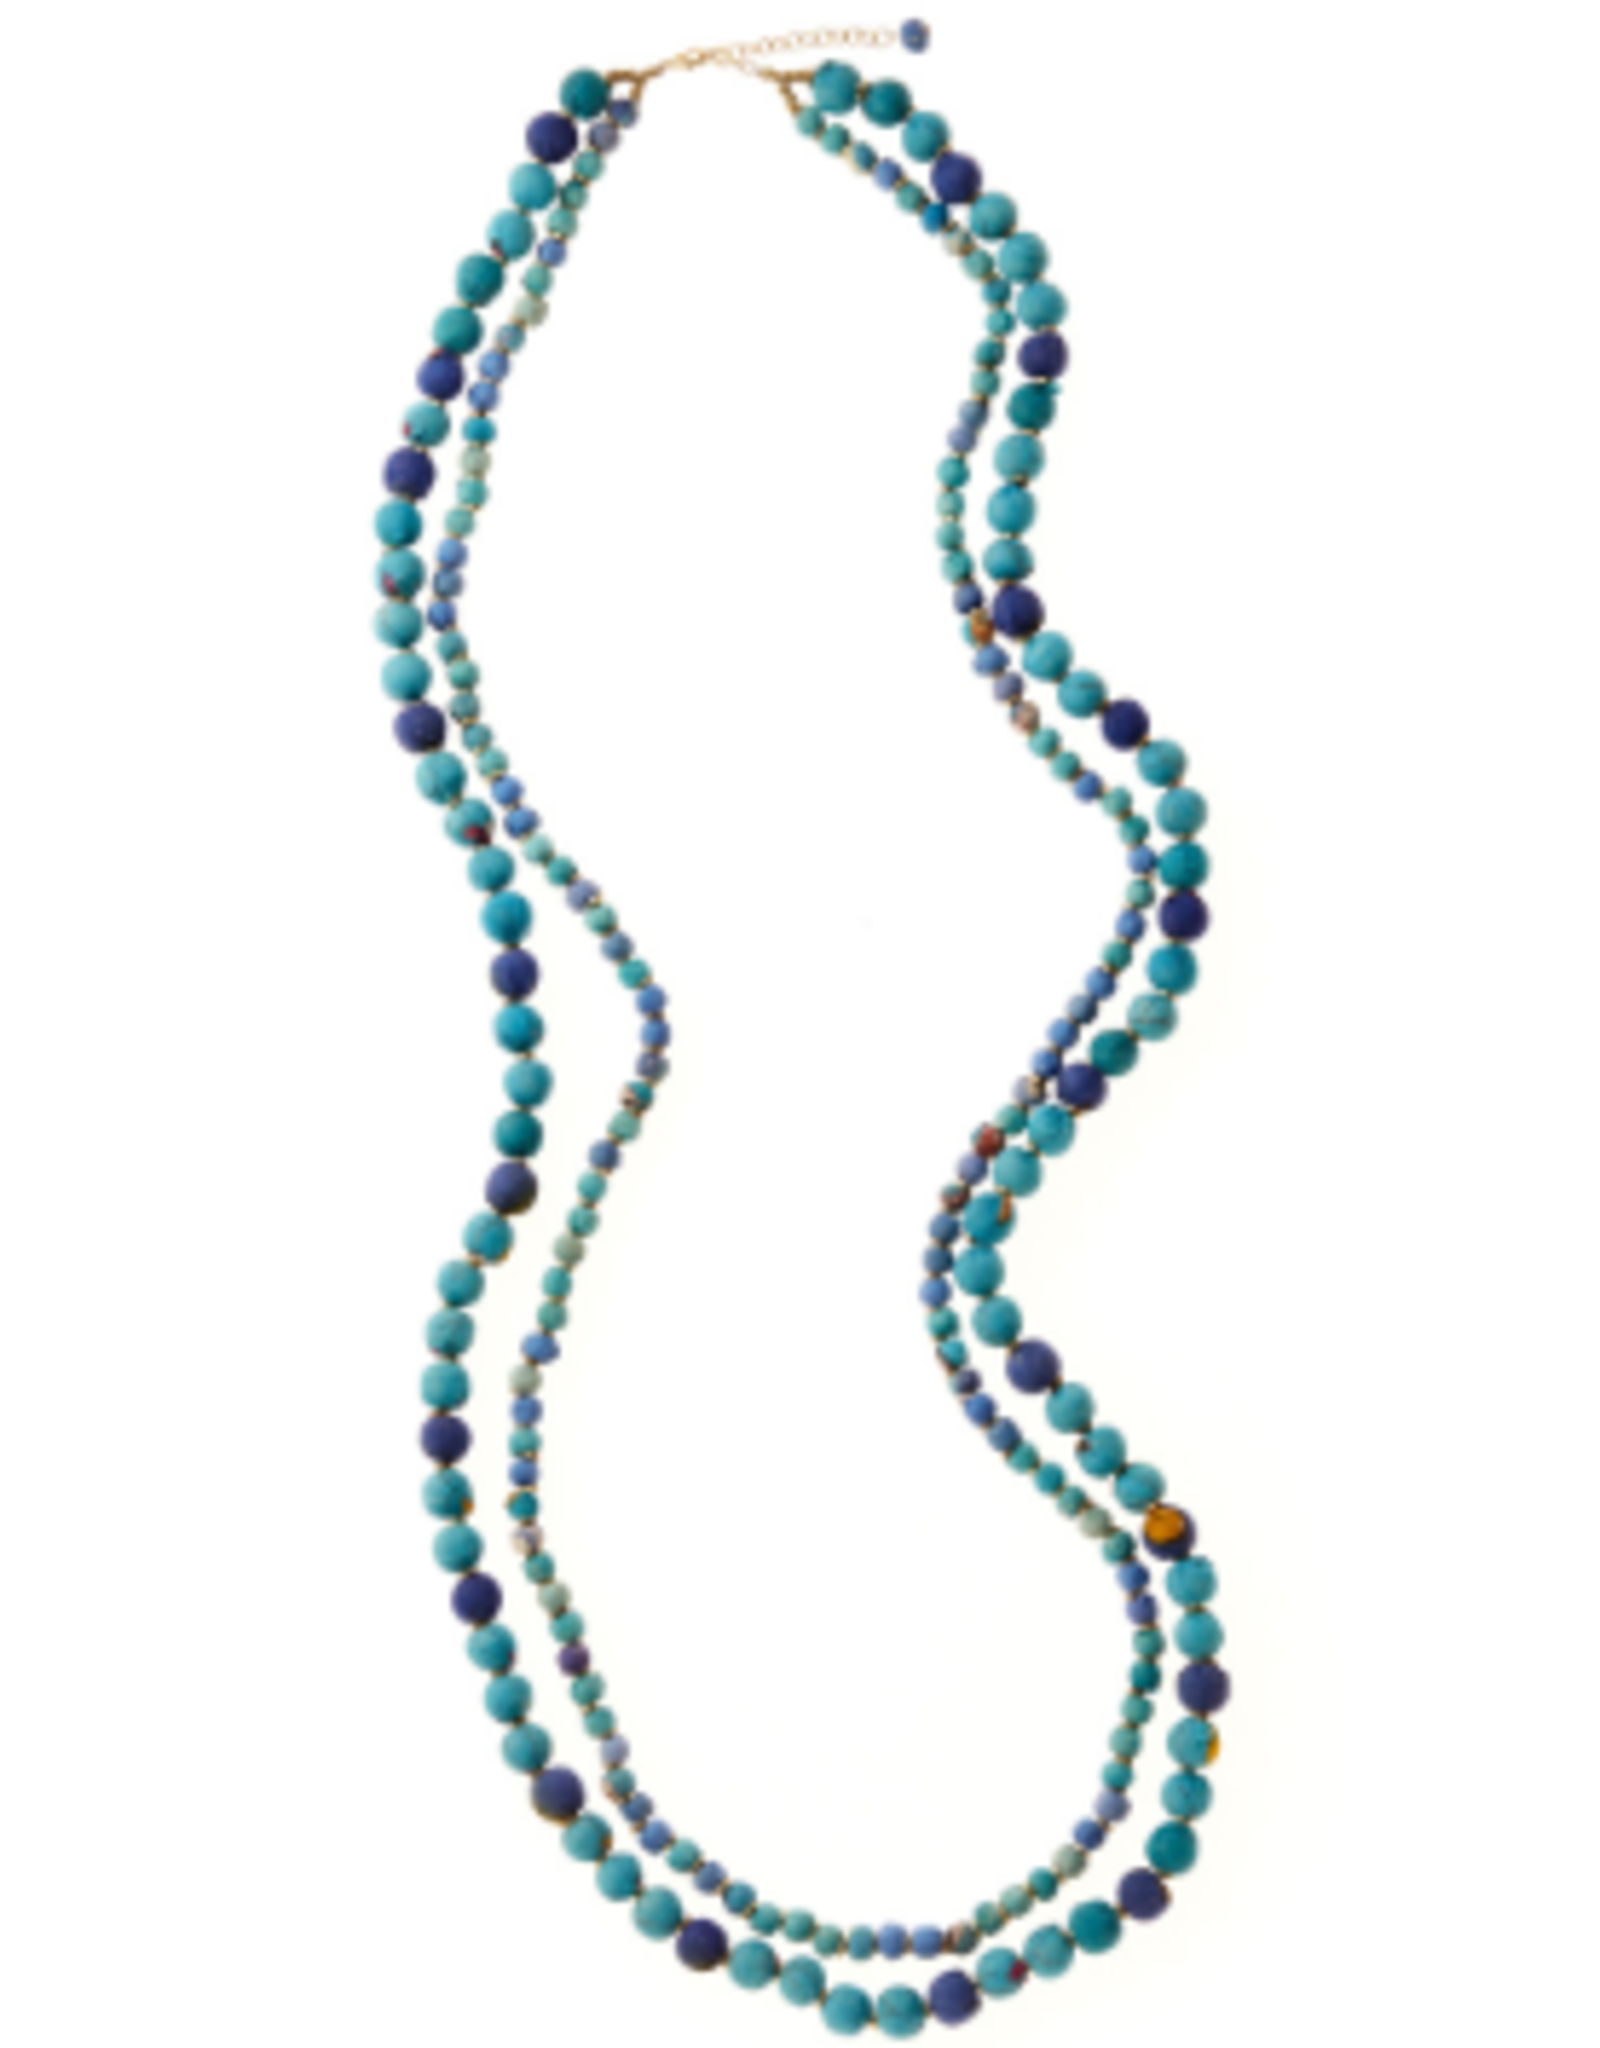 India, Neela 2 strand sari necklace